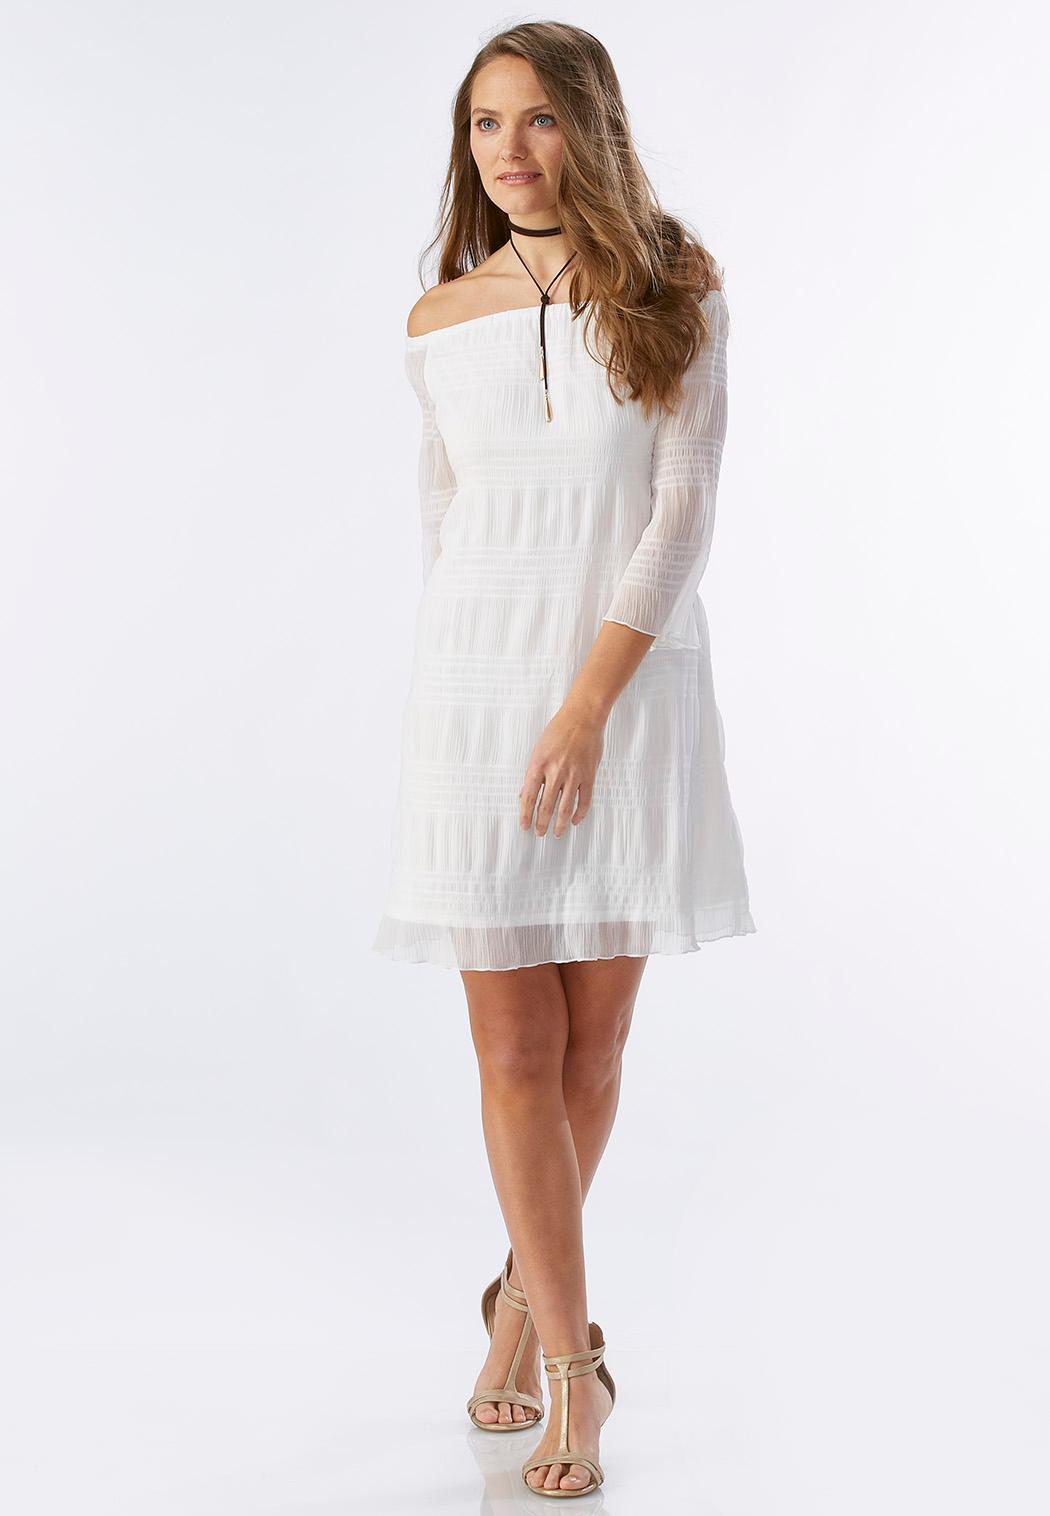 Women S Plus Size Dresses Cato Fashions